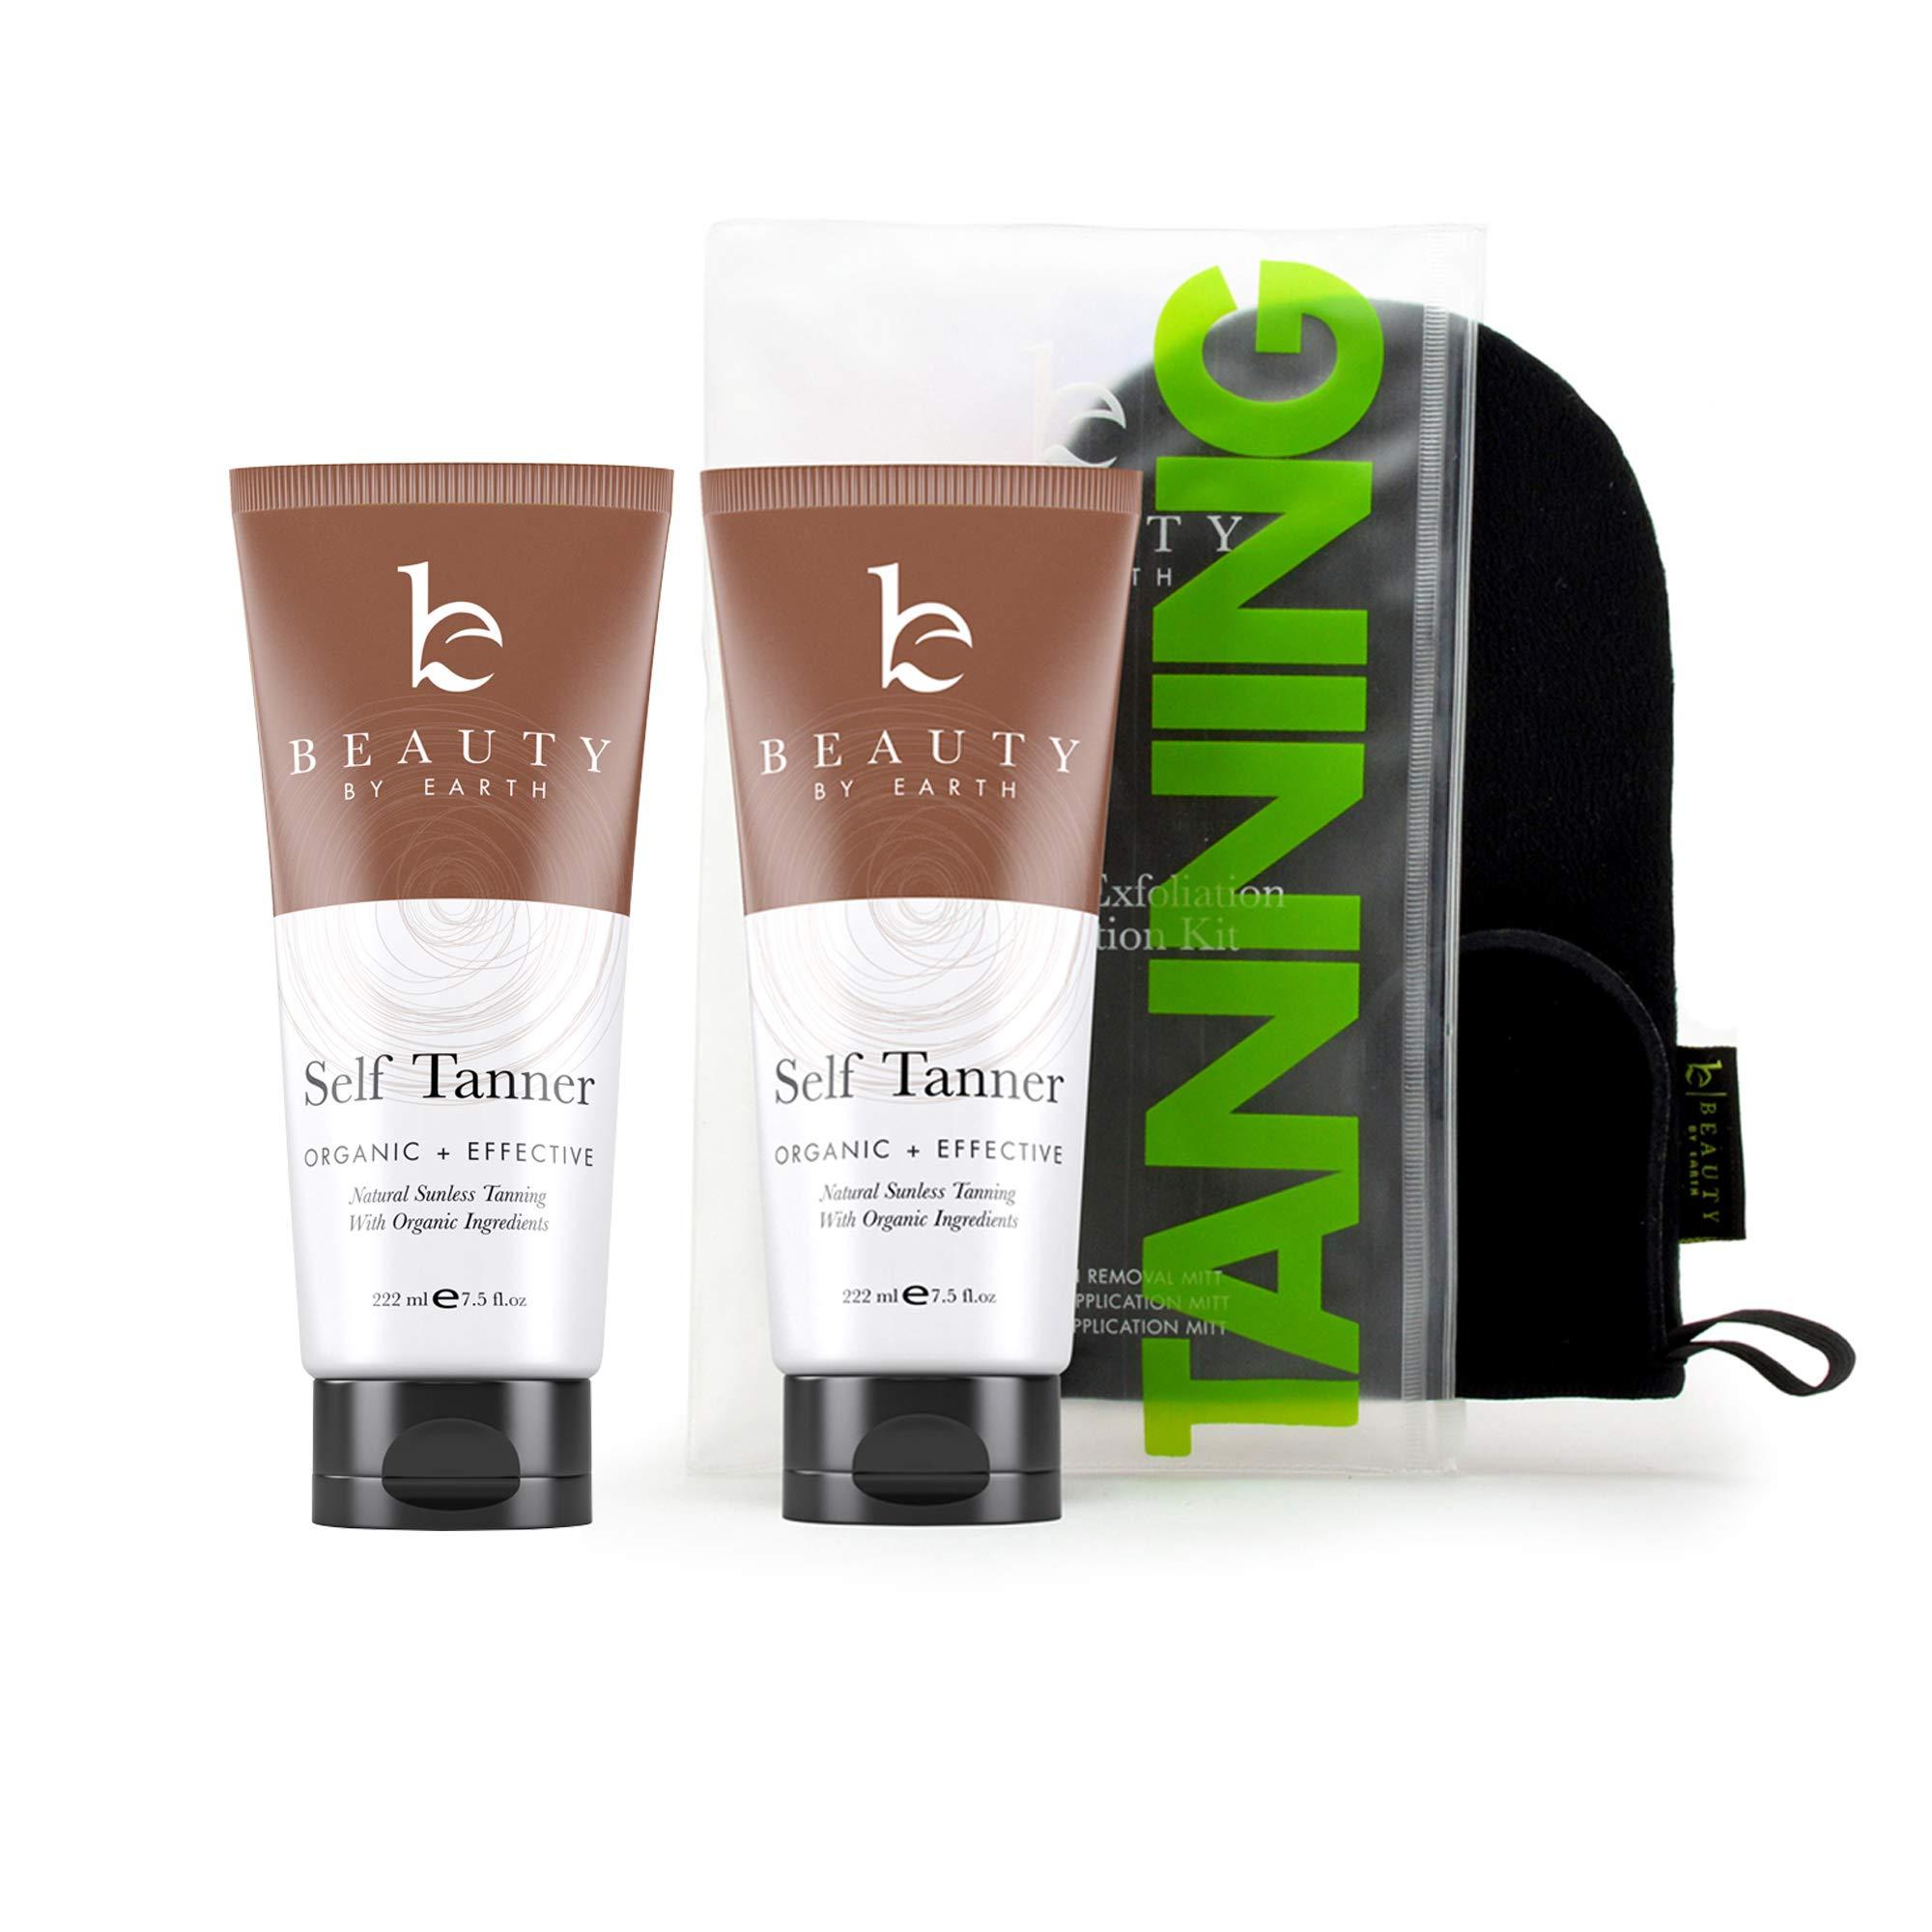 Self Tanner & Tanning Mitt Set - With Natural Tanning Lotion, Exfoliating Gloves, Self Tanner Mitt for Body and Face Tanner Tanning Mit, Best Self Tanning Lotion Kit for Your Self Tan (2 bottles)